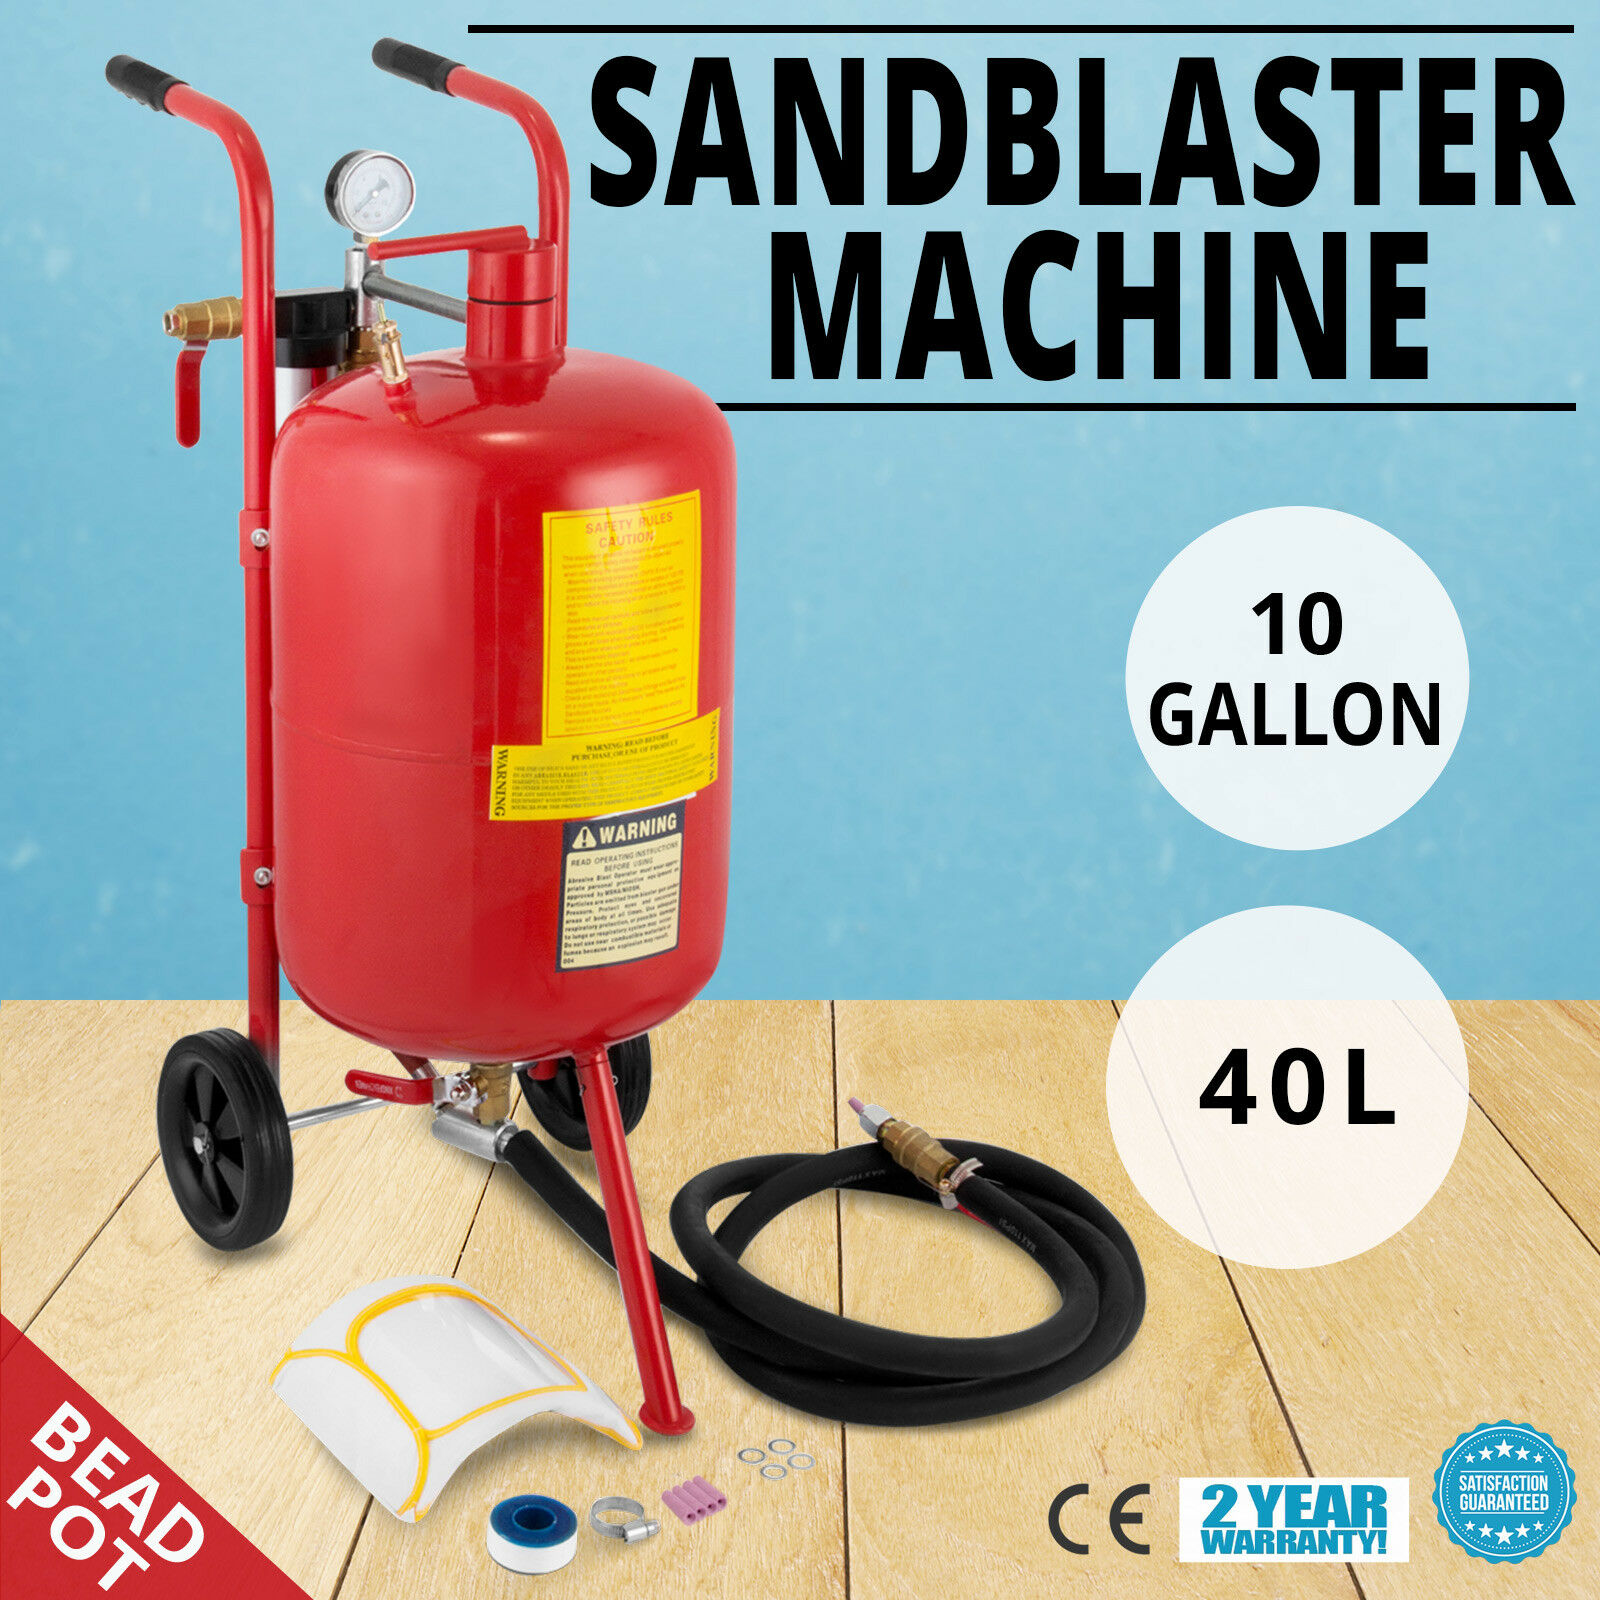 Sandblaster Bead Pot Sand Blaster Grit Blasting Blast Sandblasting Water Trap